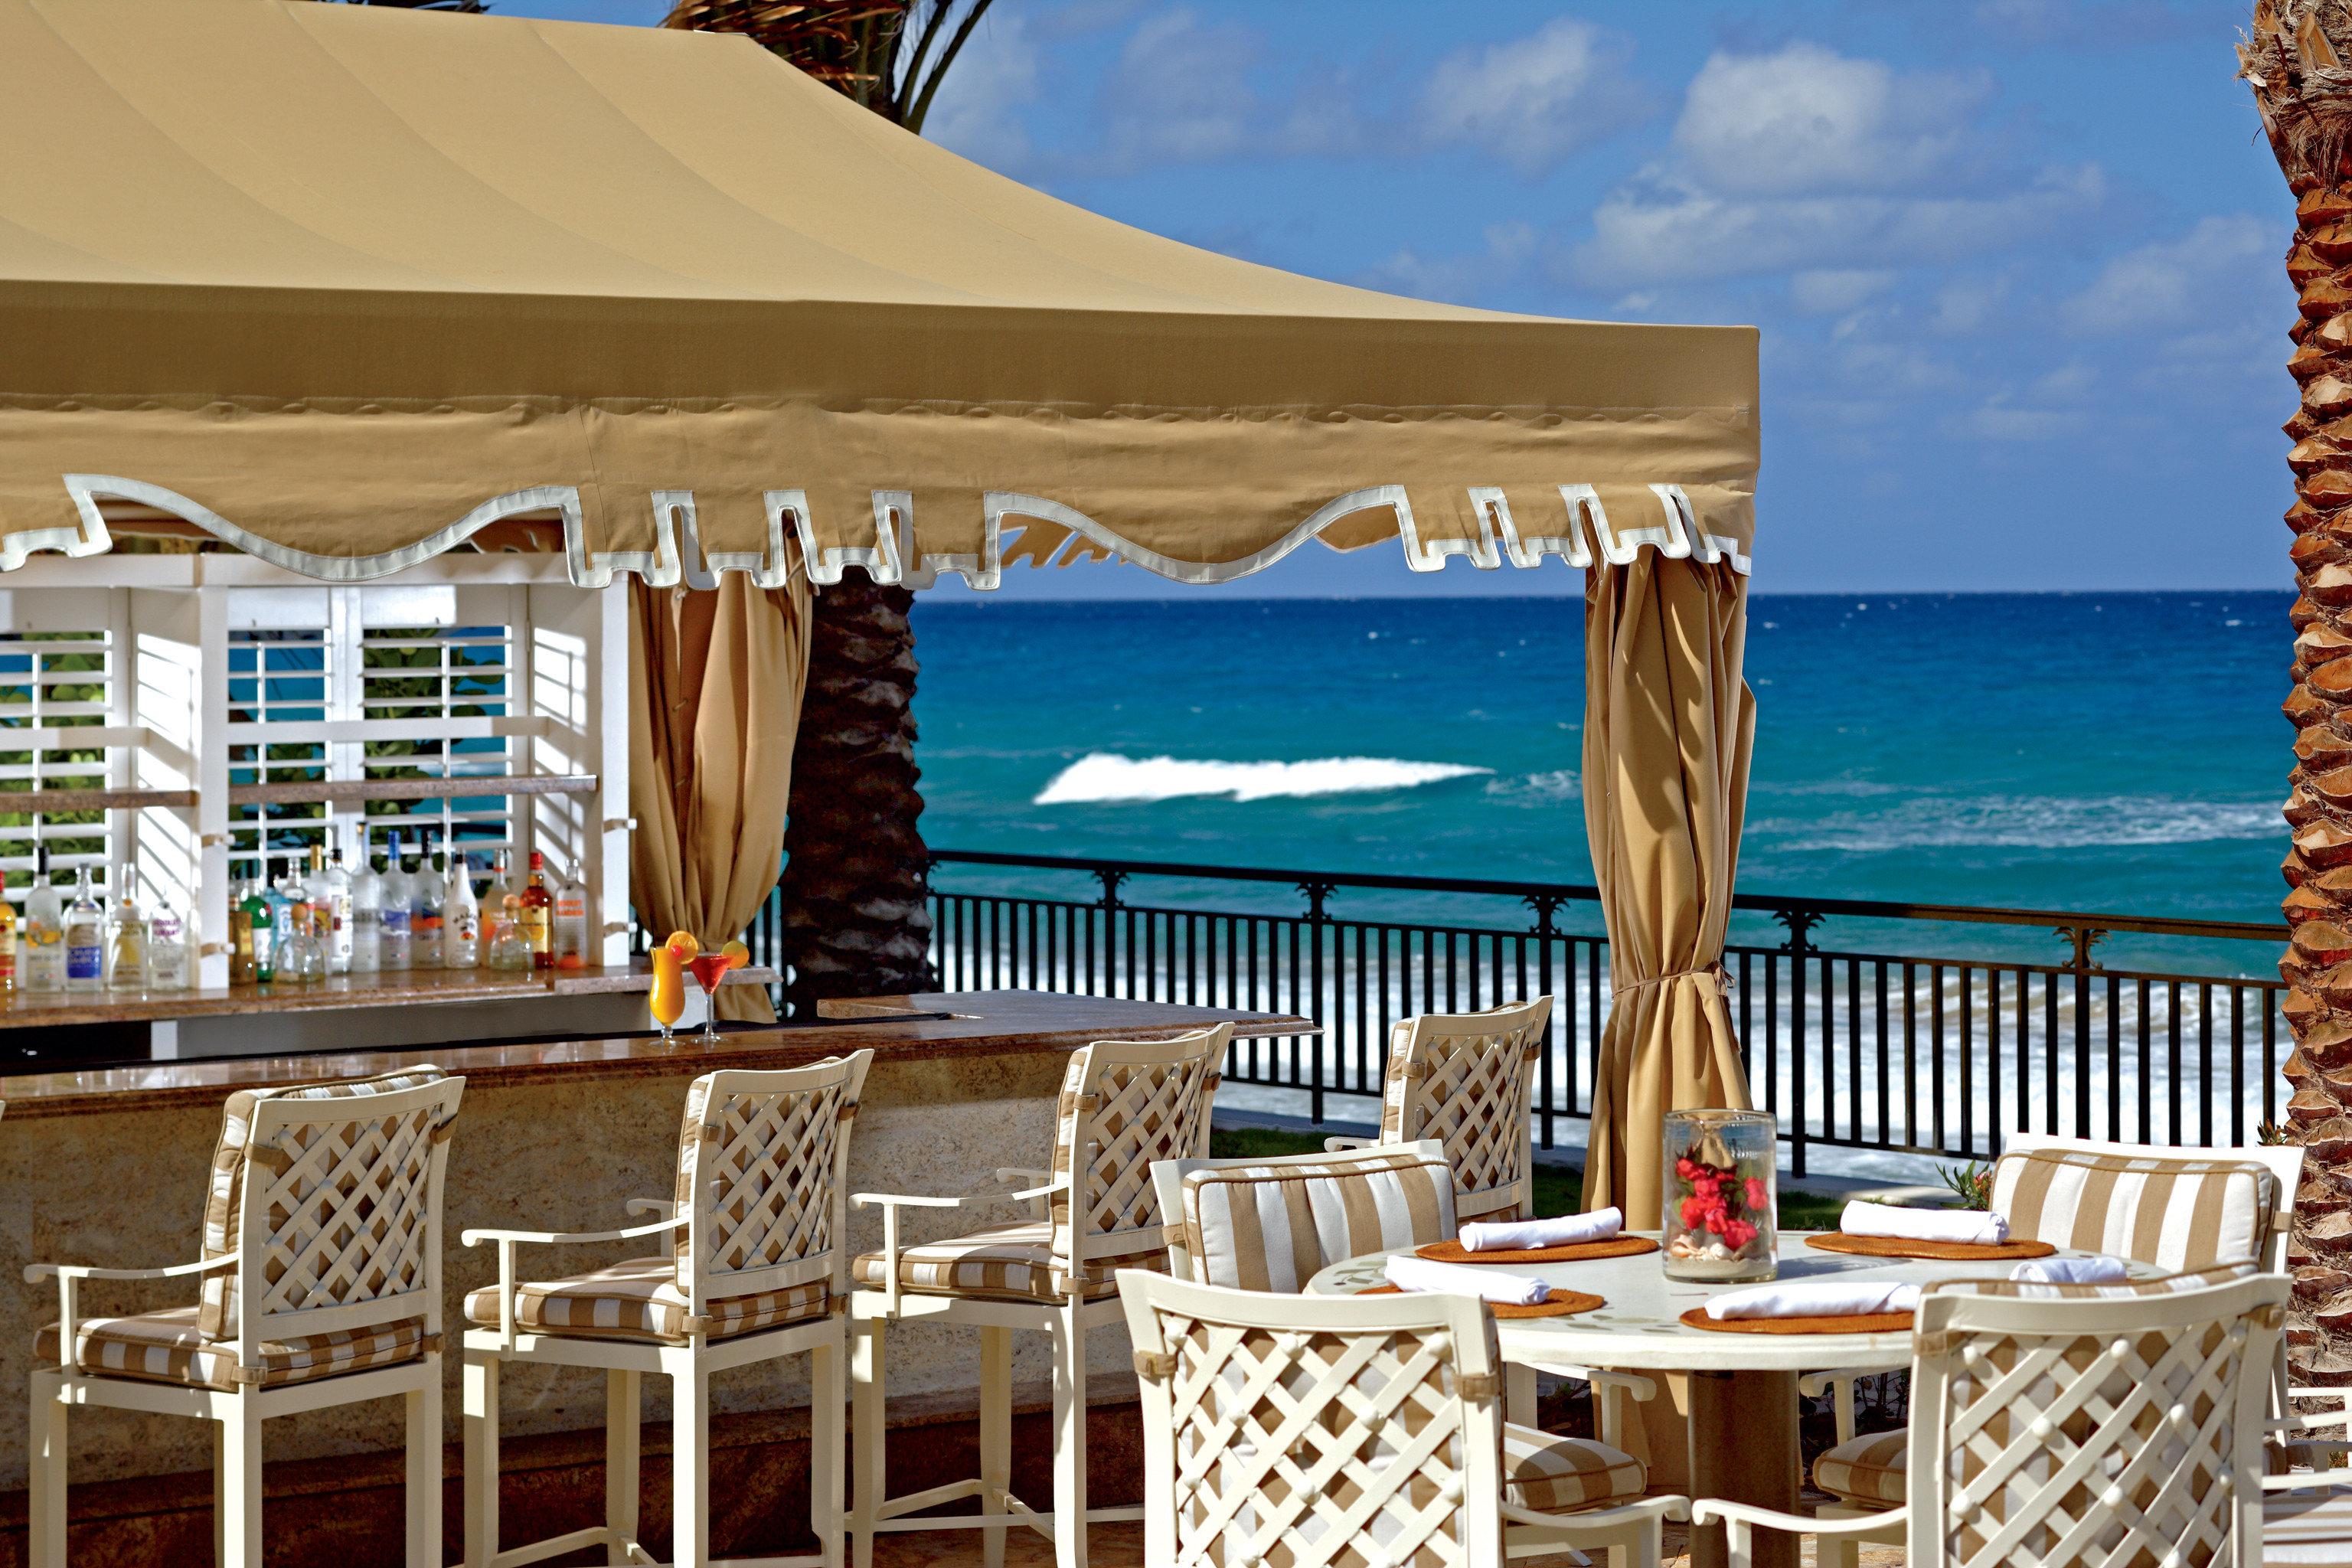 Bar Drink Modern Outdoors Resort Waterfront chair restaurant palace Deck day